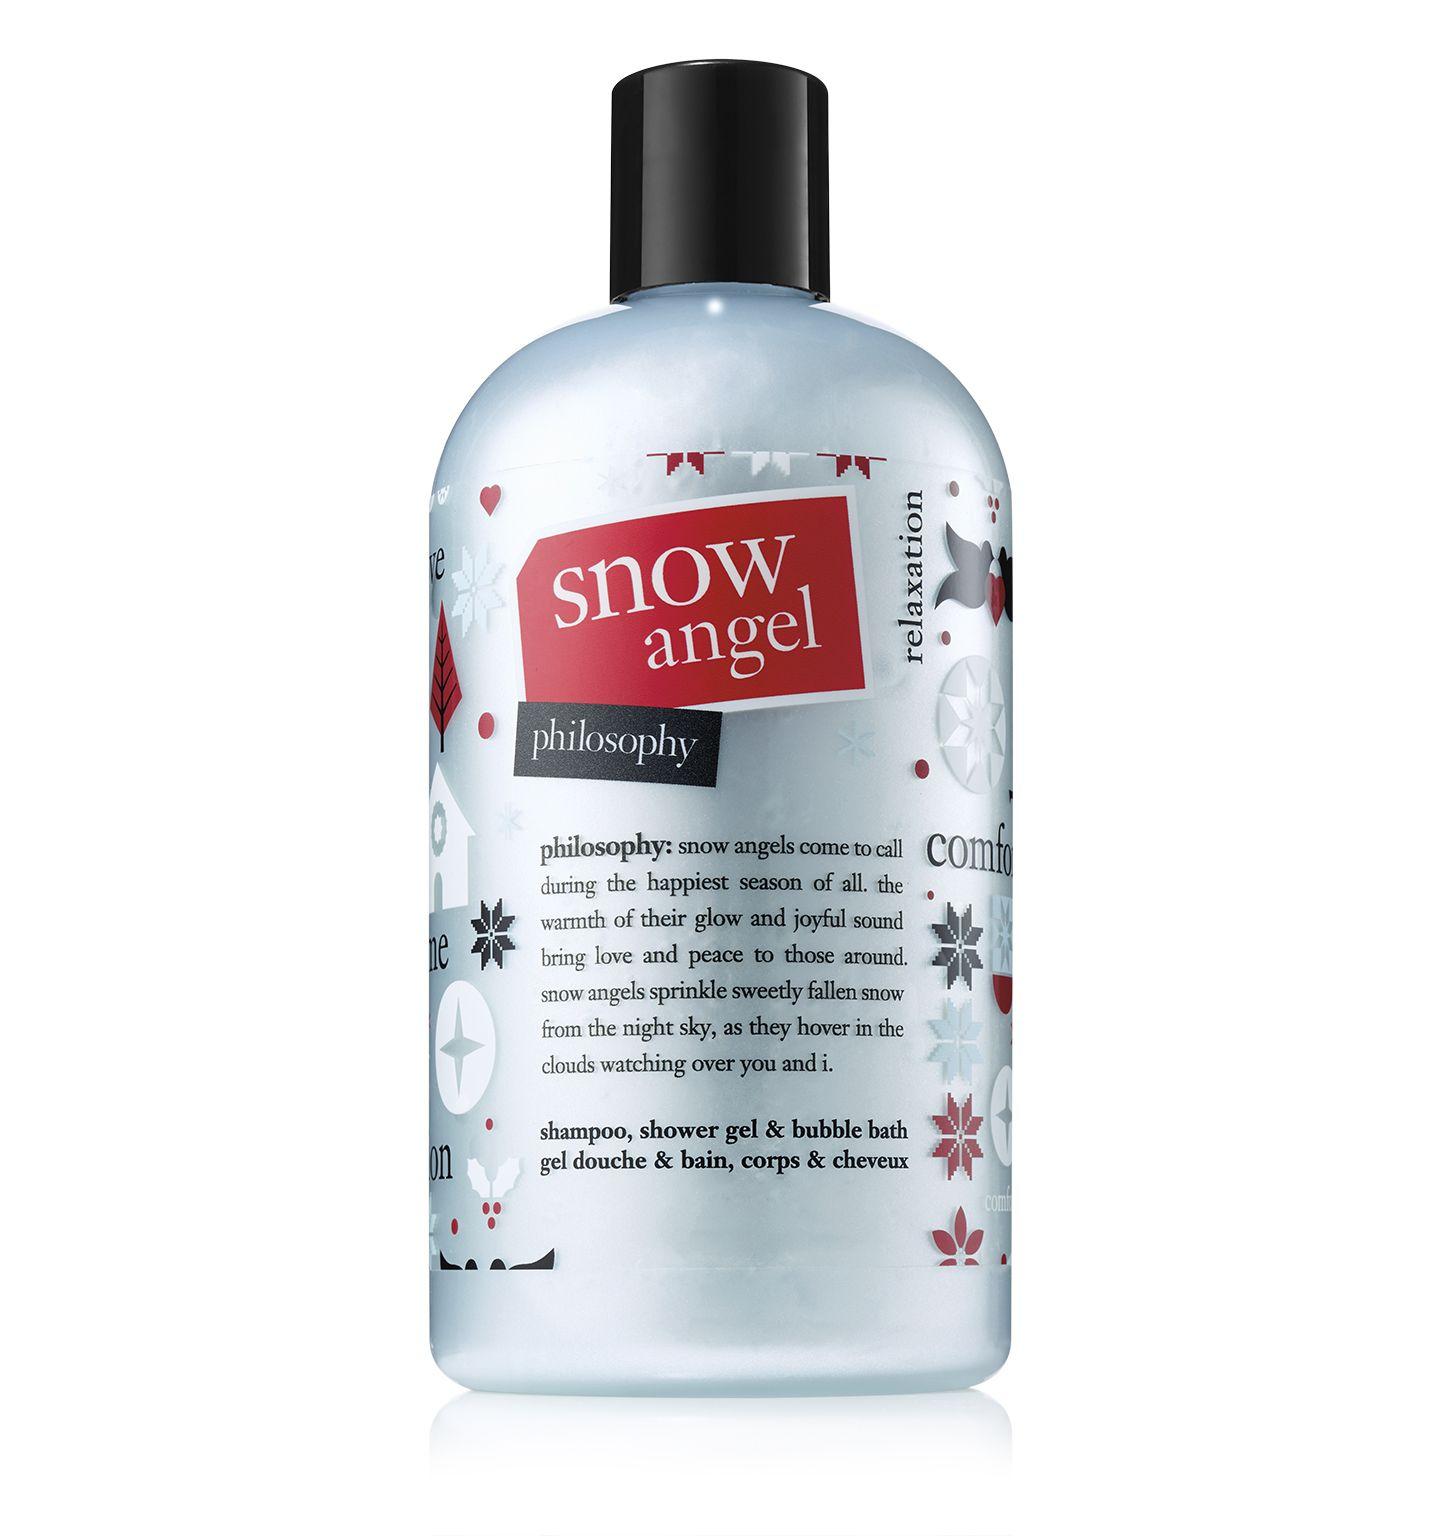 Philosophy Snow Angel Shower Gel Body Care Routine Snow Angels